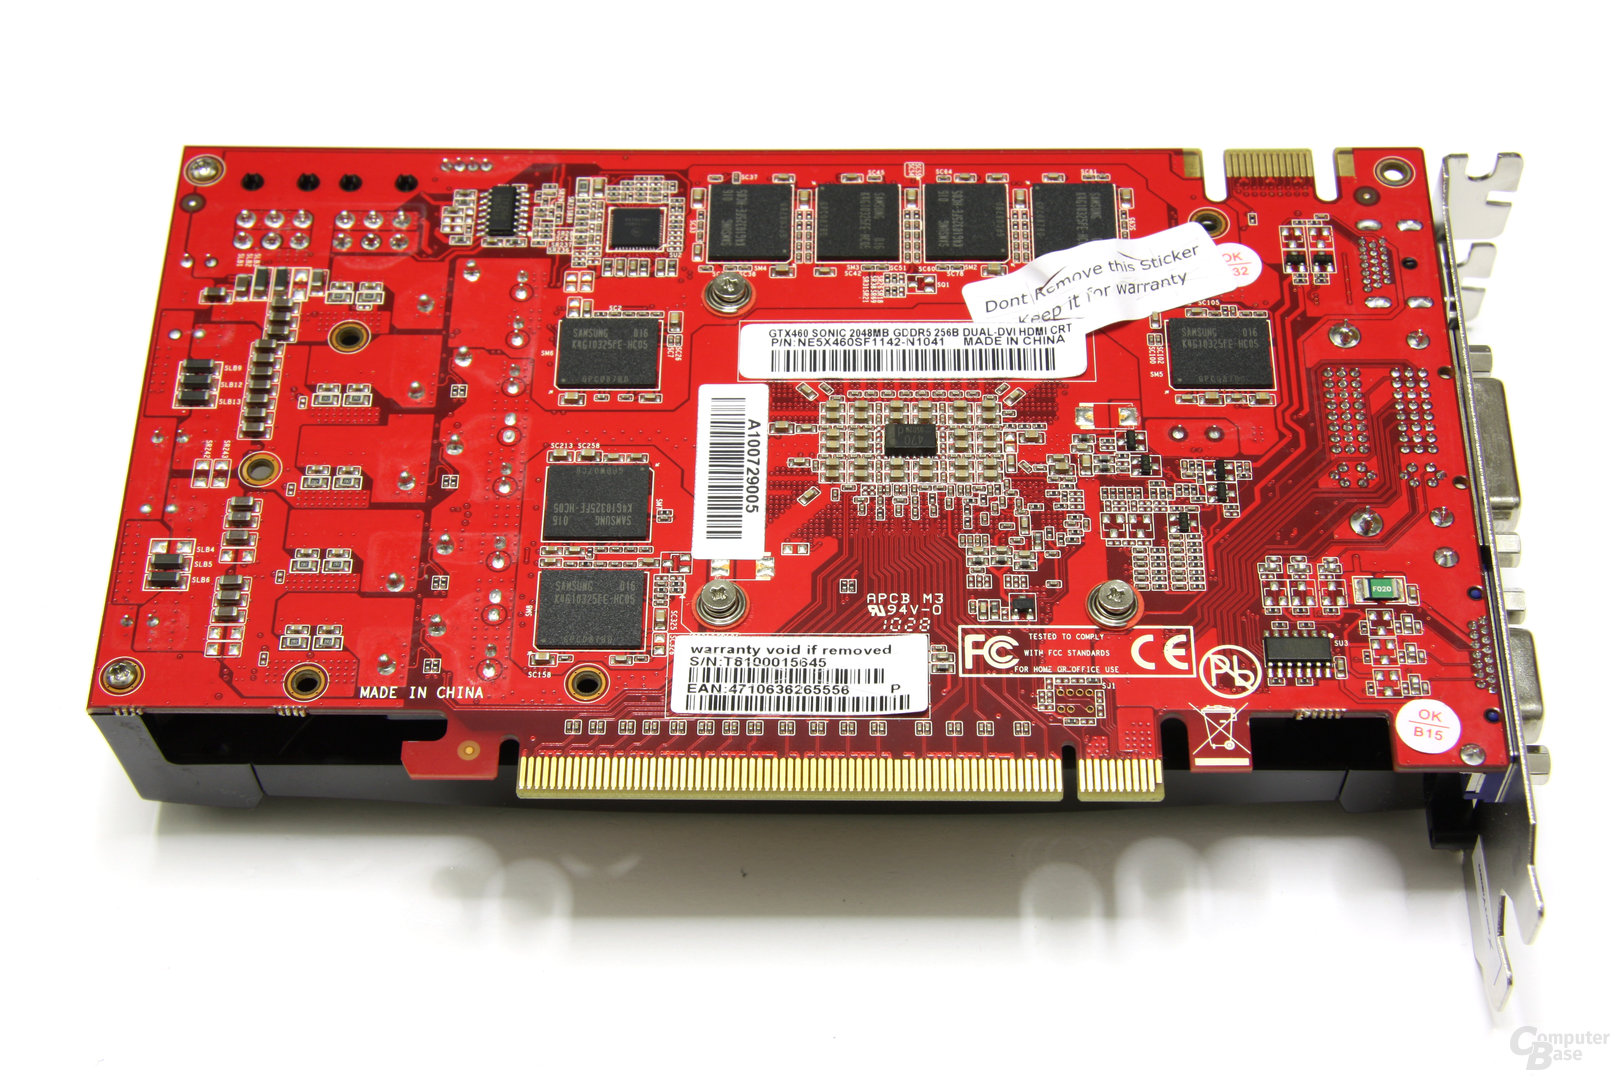 GeForce GTX 460 Sonic 2GB Rückseite